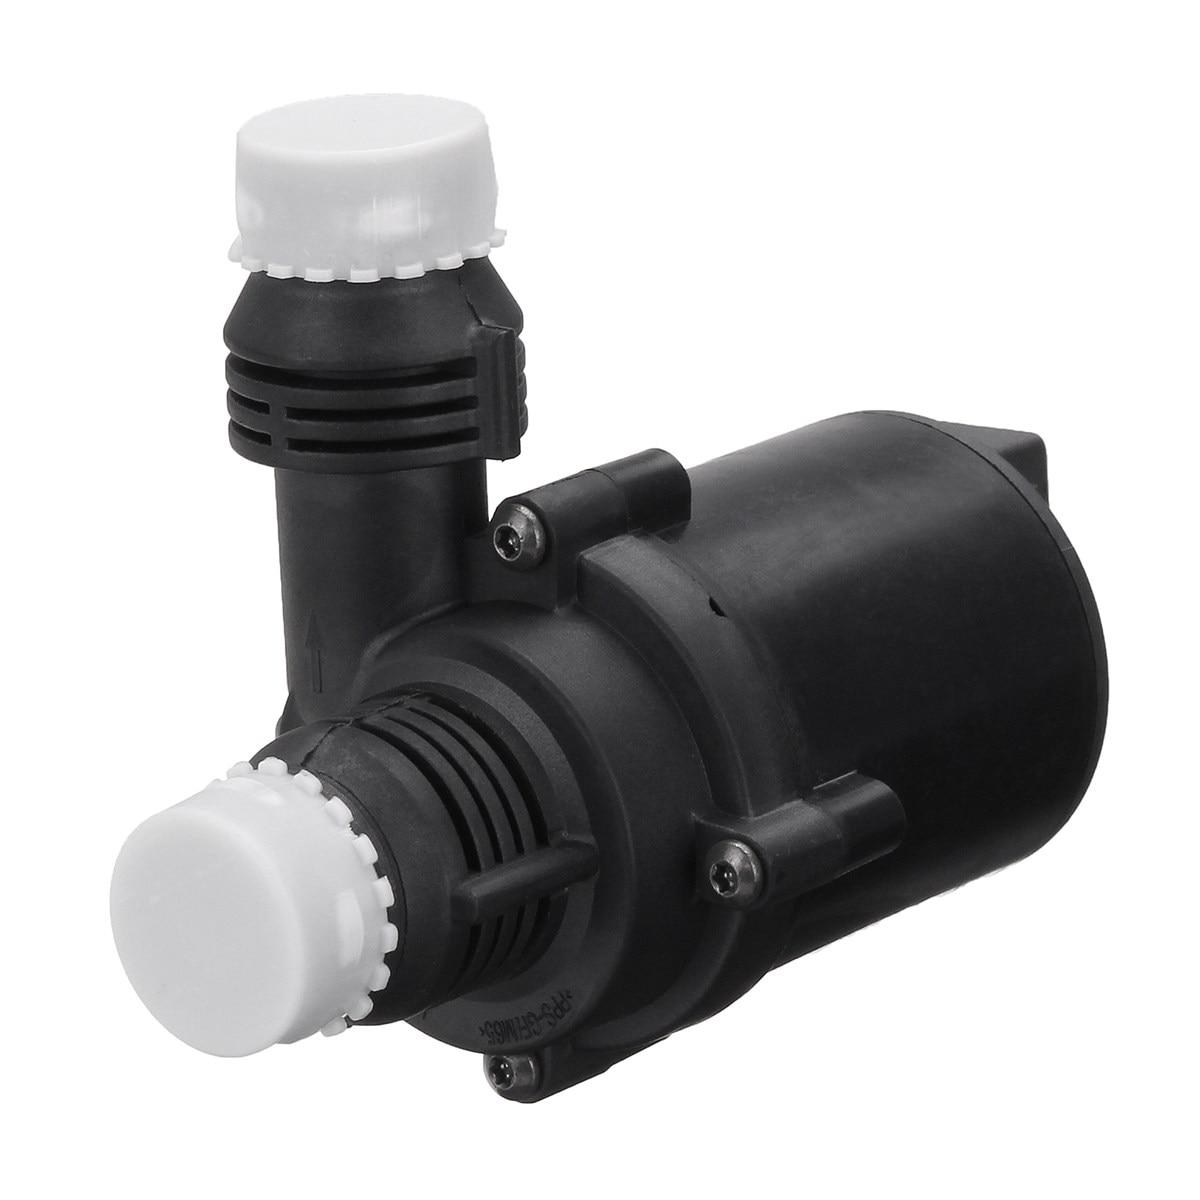 small resolution of  64116903350 cooling water pump replacement for bmw e38 e39 e65 e66 e67 x5 e53 1994 1995 1996 1997 1998 1999 2000 2001 2002 2003